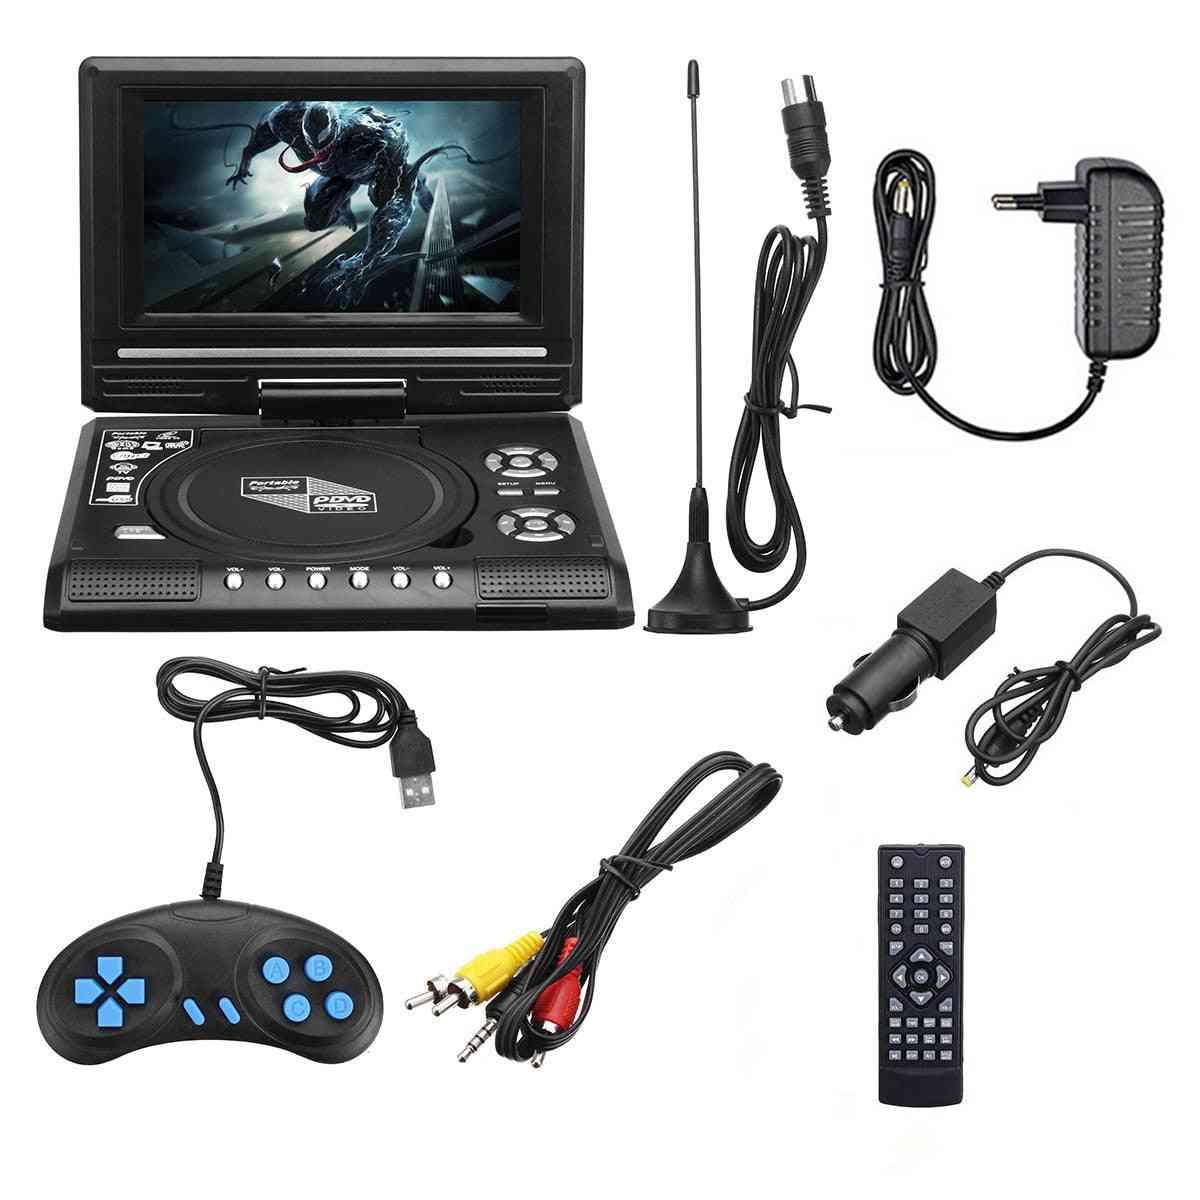 7.8 Inch Hd Tv Car Dvd Player - Usb Sd Cards, Rca Tv Portatil Cable